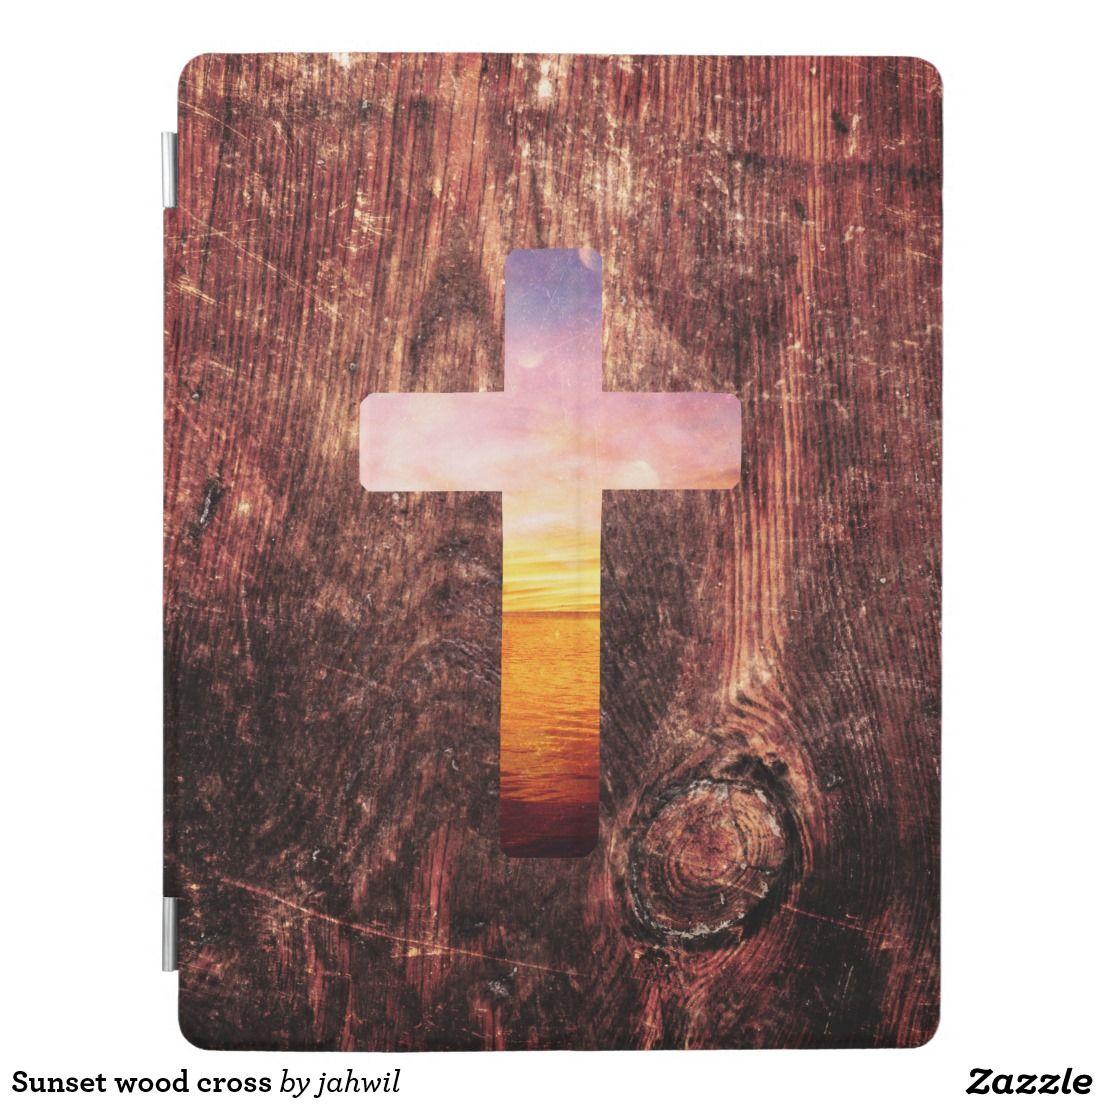 Sunset wood cross iPad cover #sunset #wood #god #cross #spirituality #vintage #ipadcase #landscape #jesus #dream #boho #religion #cute #cool #sea #beautiful #pattern #nautical #crucifix #wooden #religious #beach